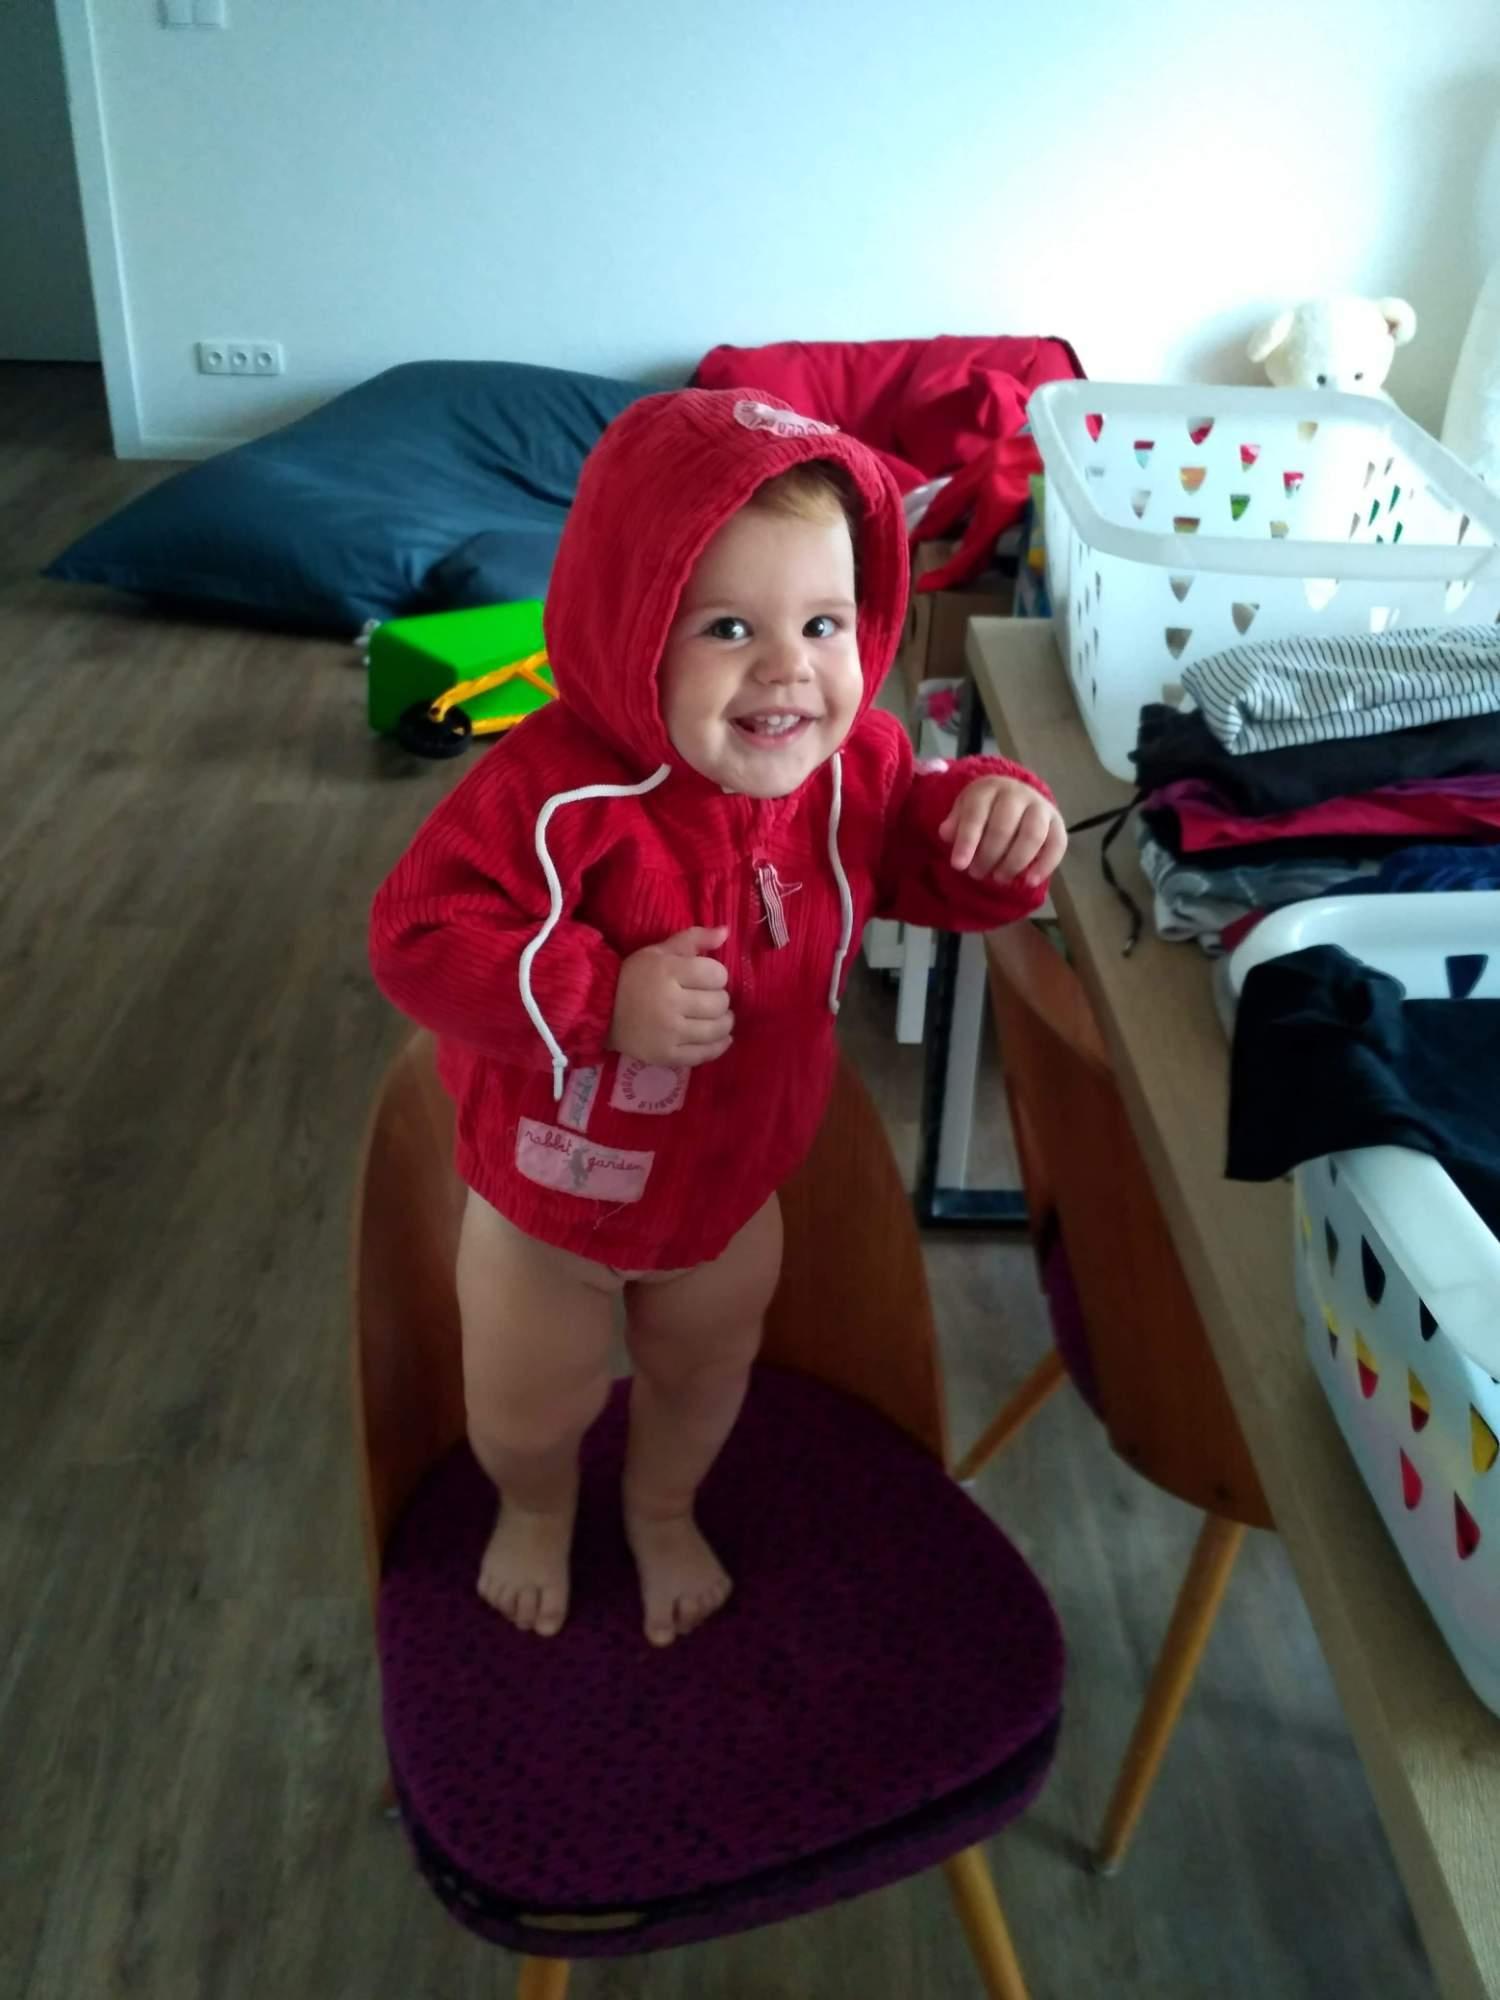 rajce.idnes.cz. baby 3